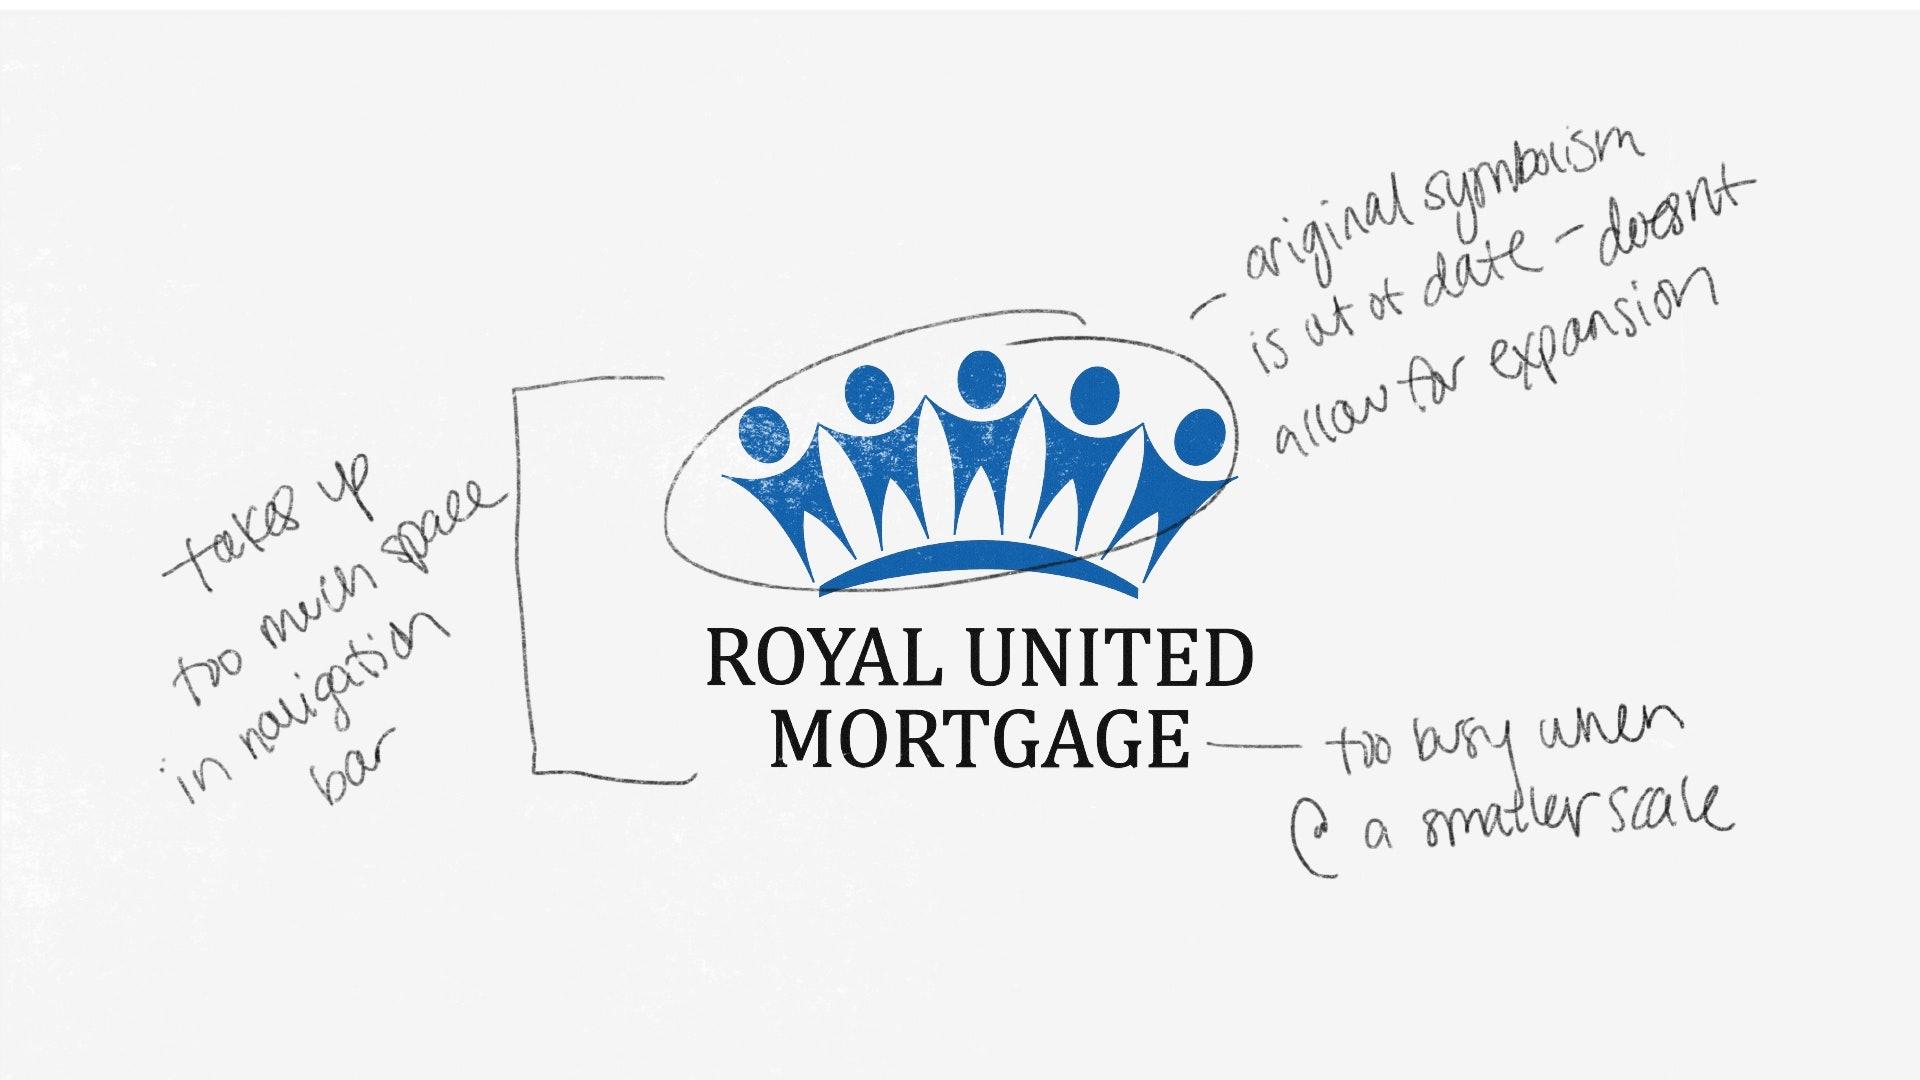 Royal United Mortgage Logo Notes